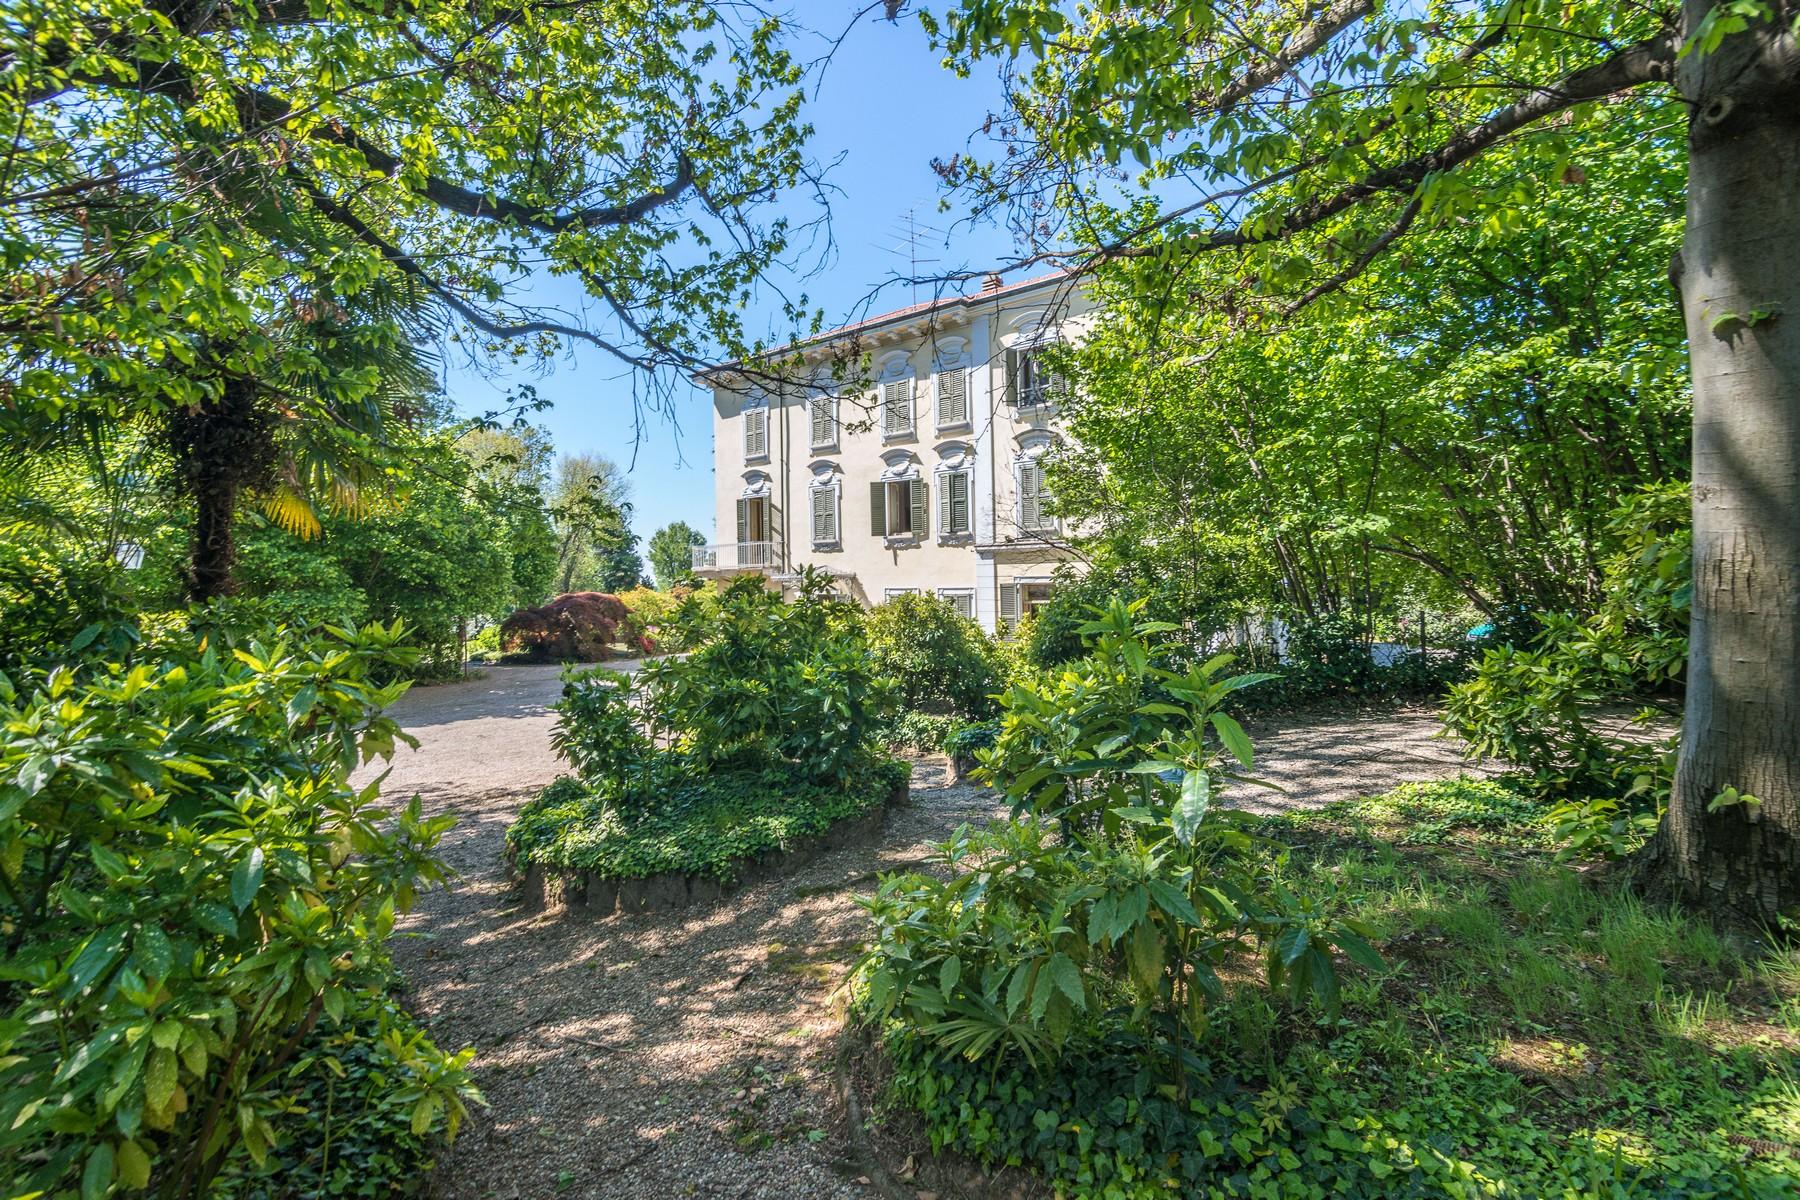 Villa in Vendita a Varese: 5 locali, 1500 mq - Foto 6